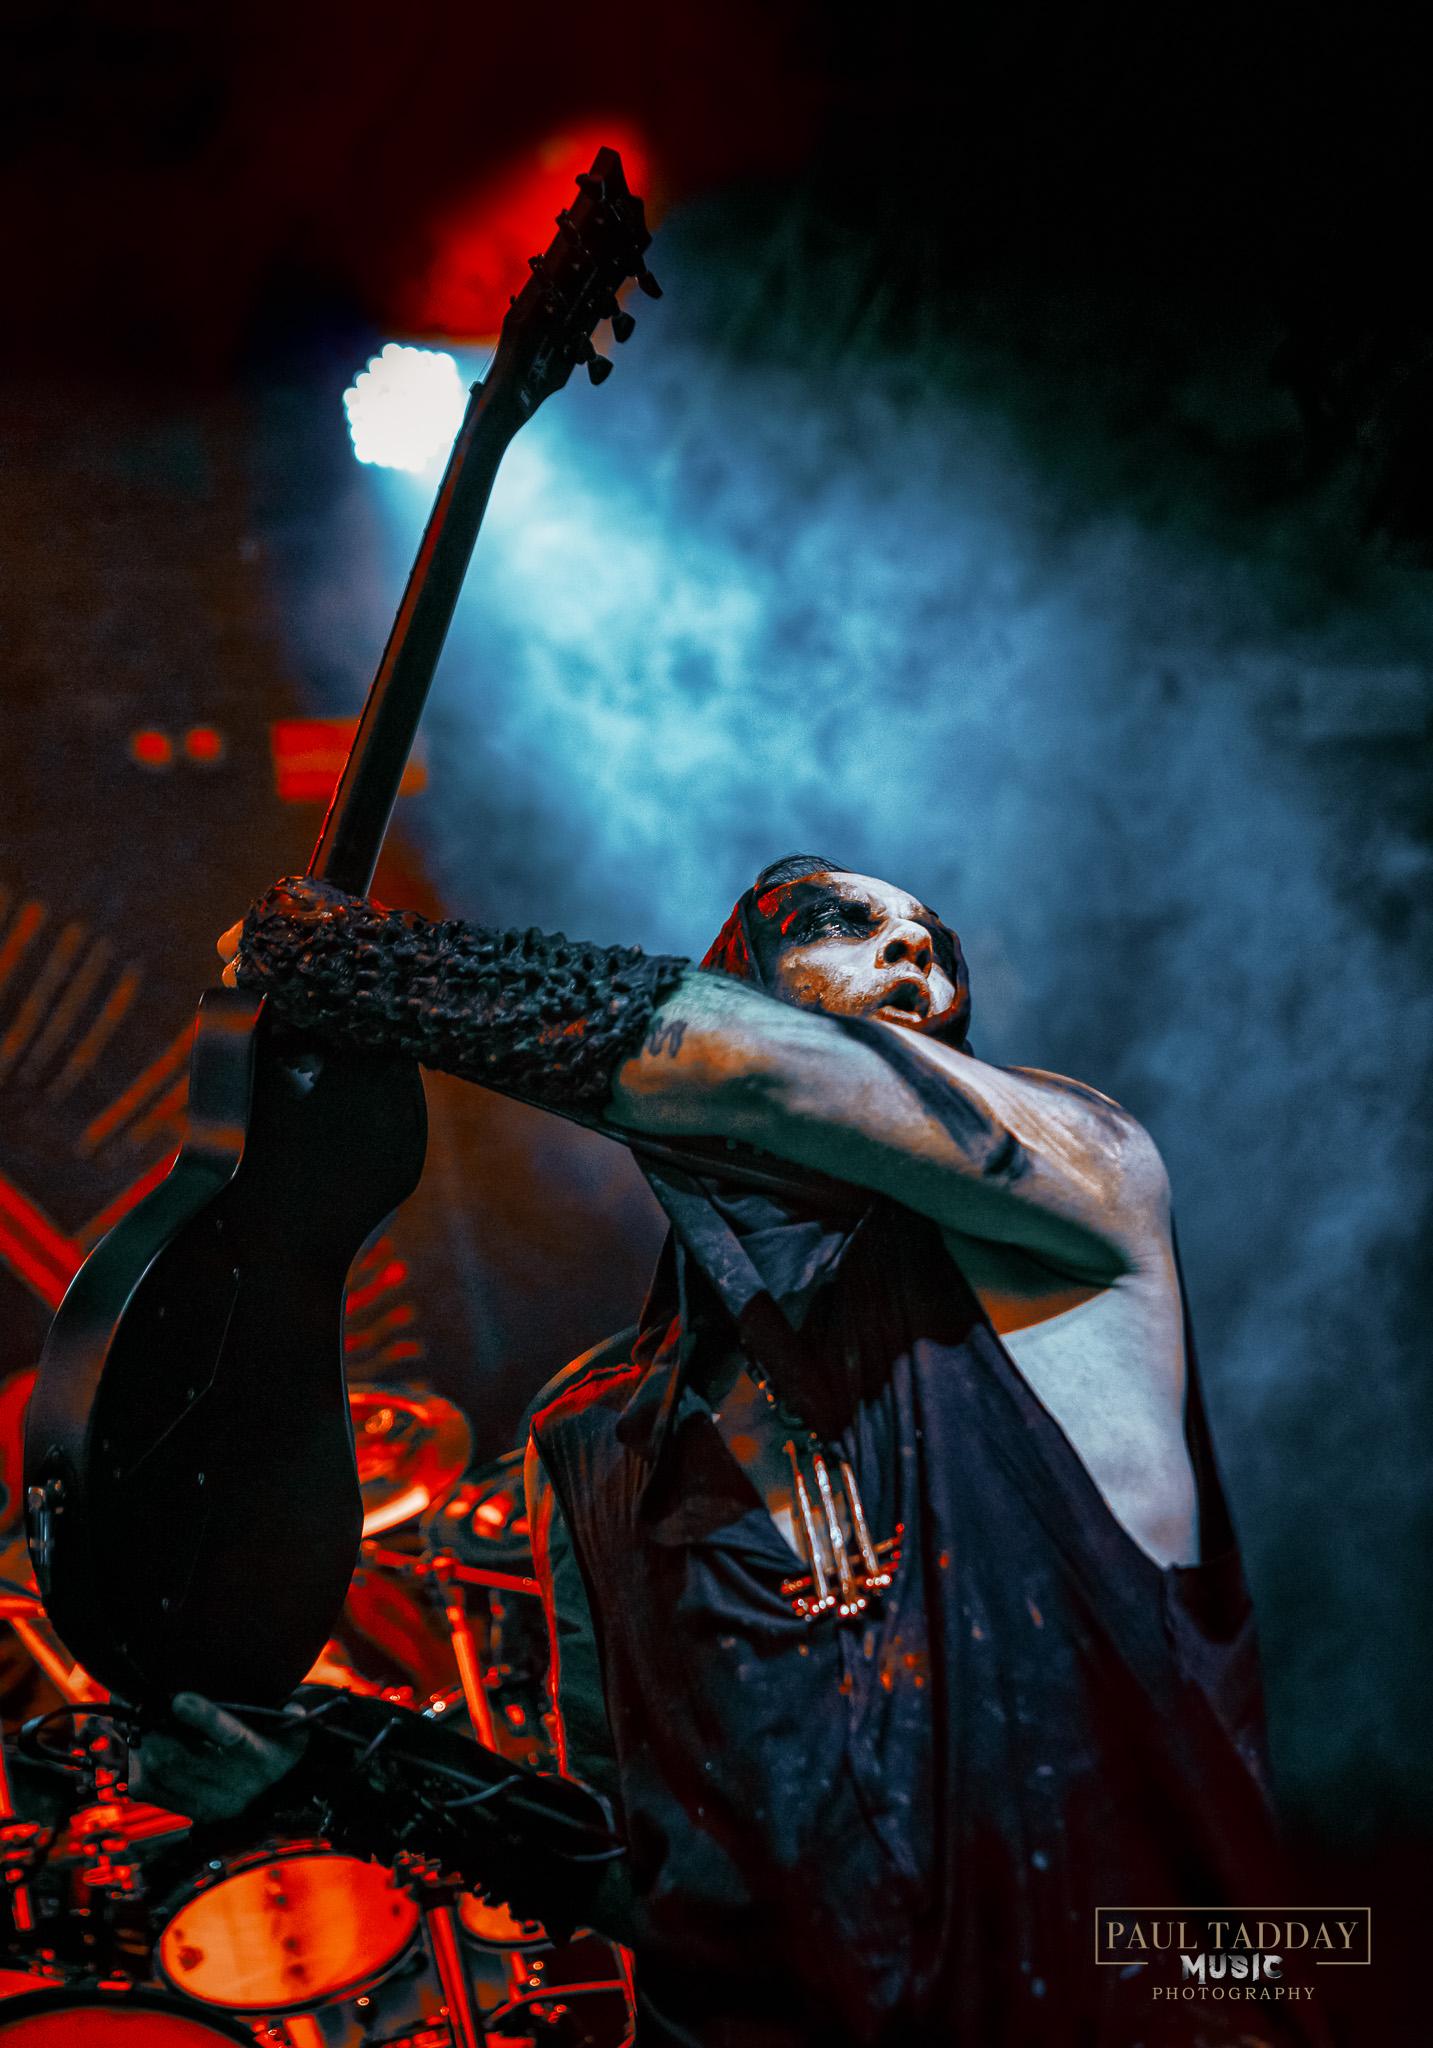 behemoth - brisbane - march 7 2019 - web - paul tadday photography - 32.jpg